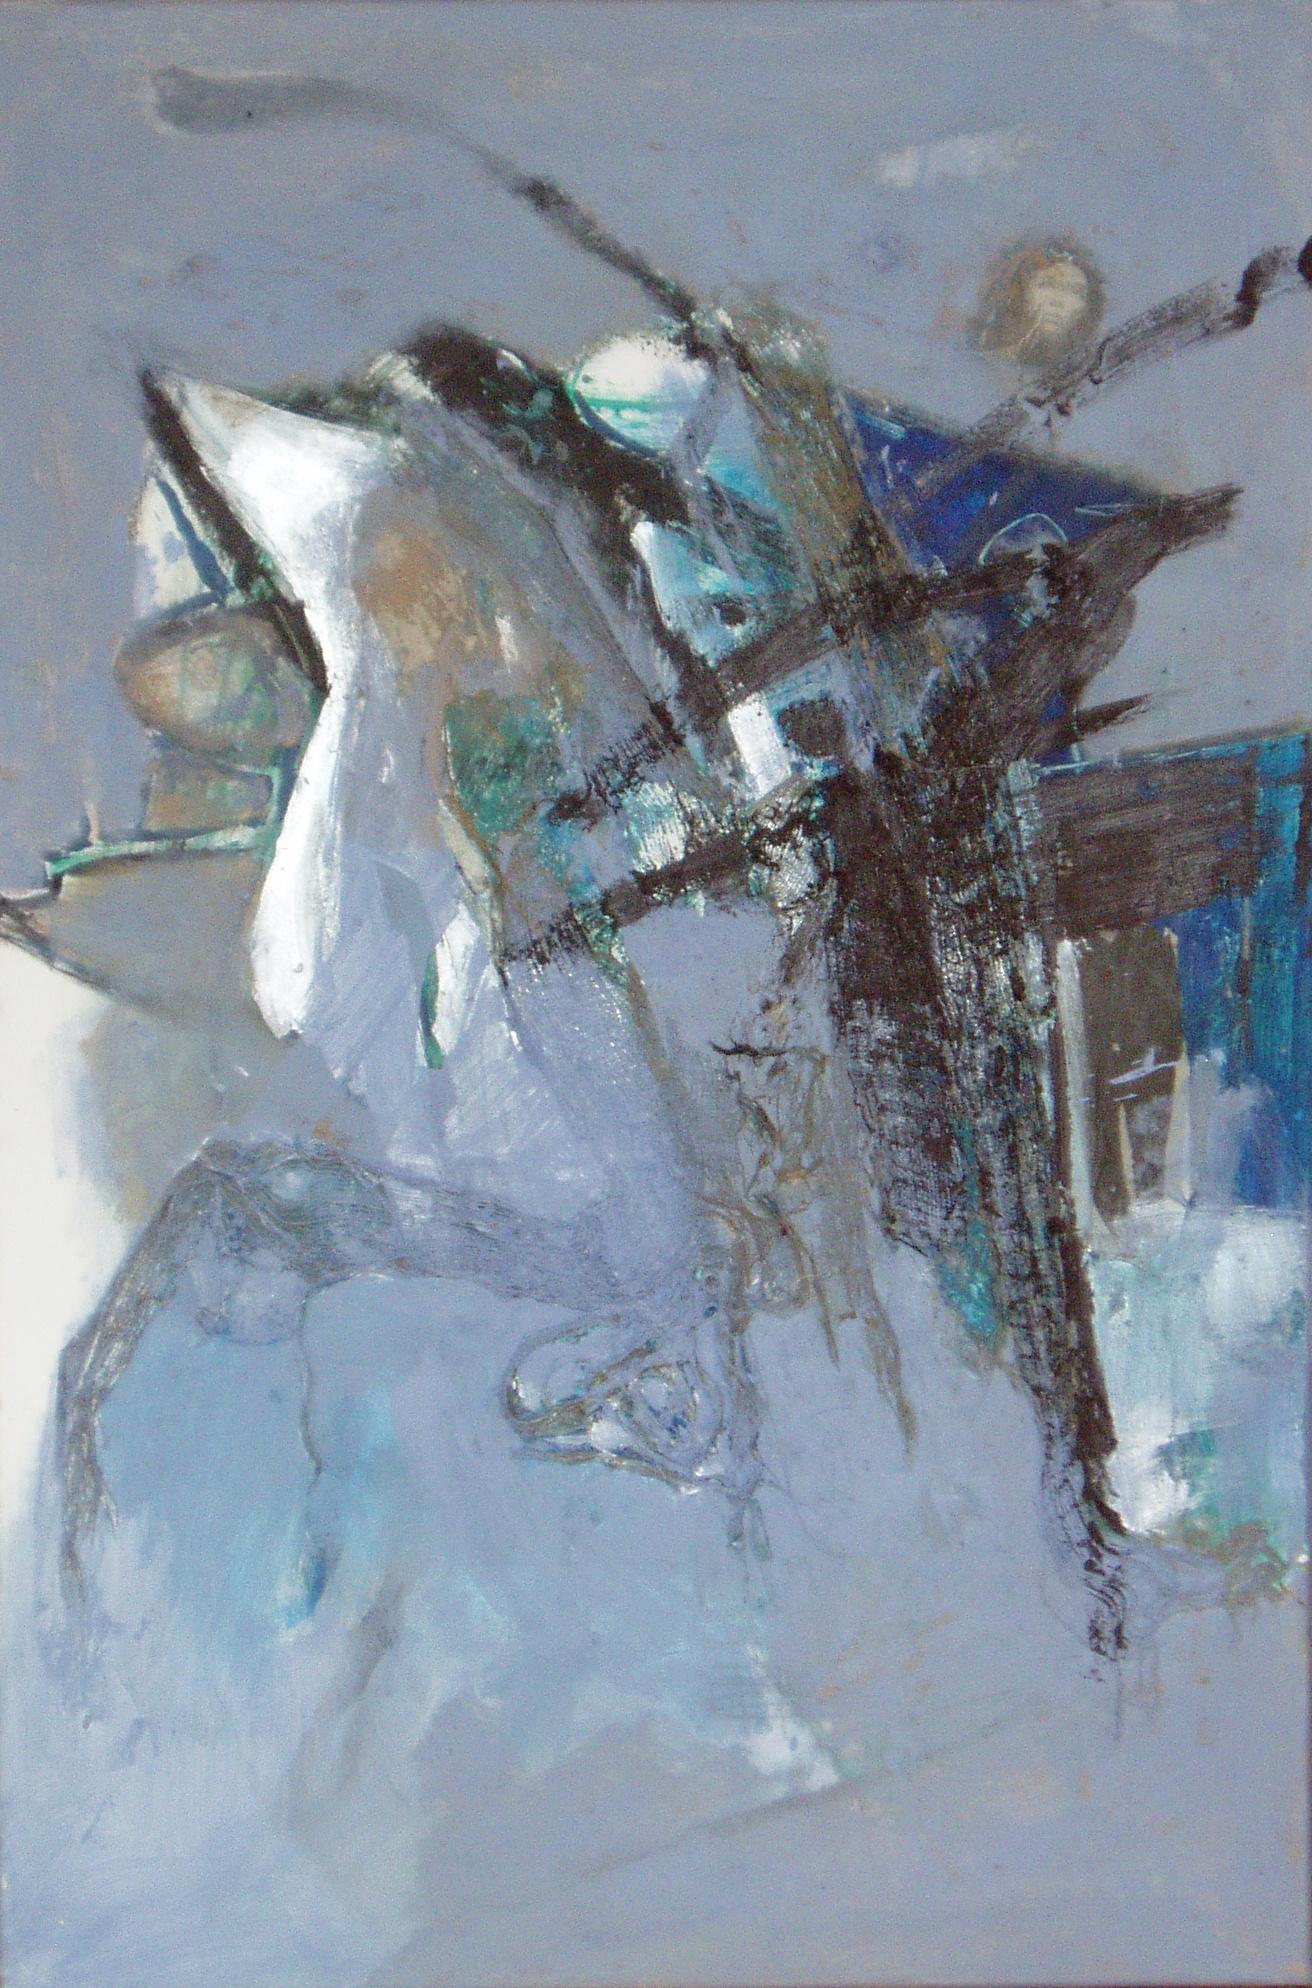 Abhebung, 2006, 80x120cm, Mischtechnik / Leinwand